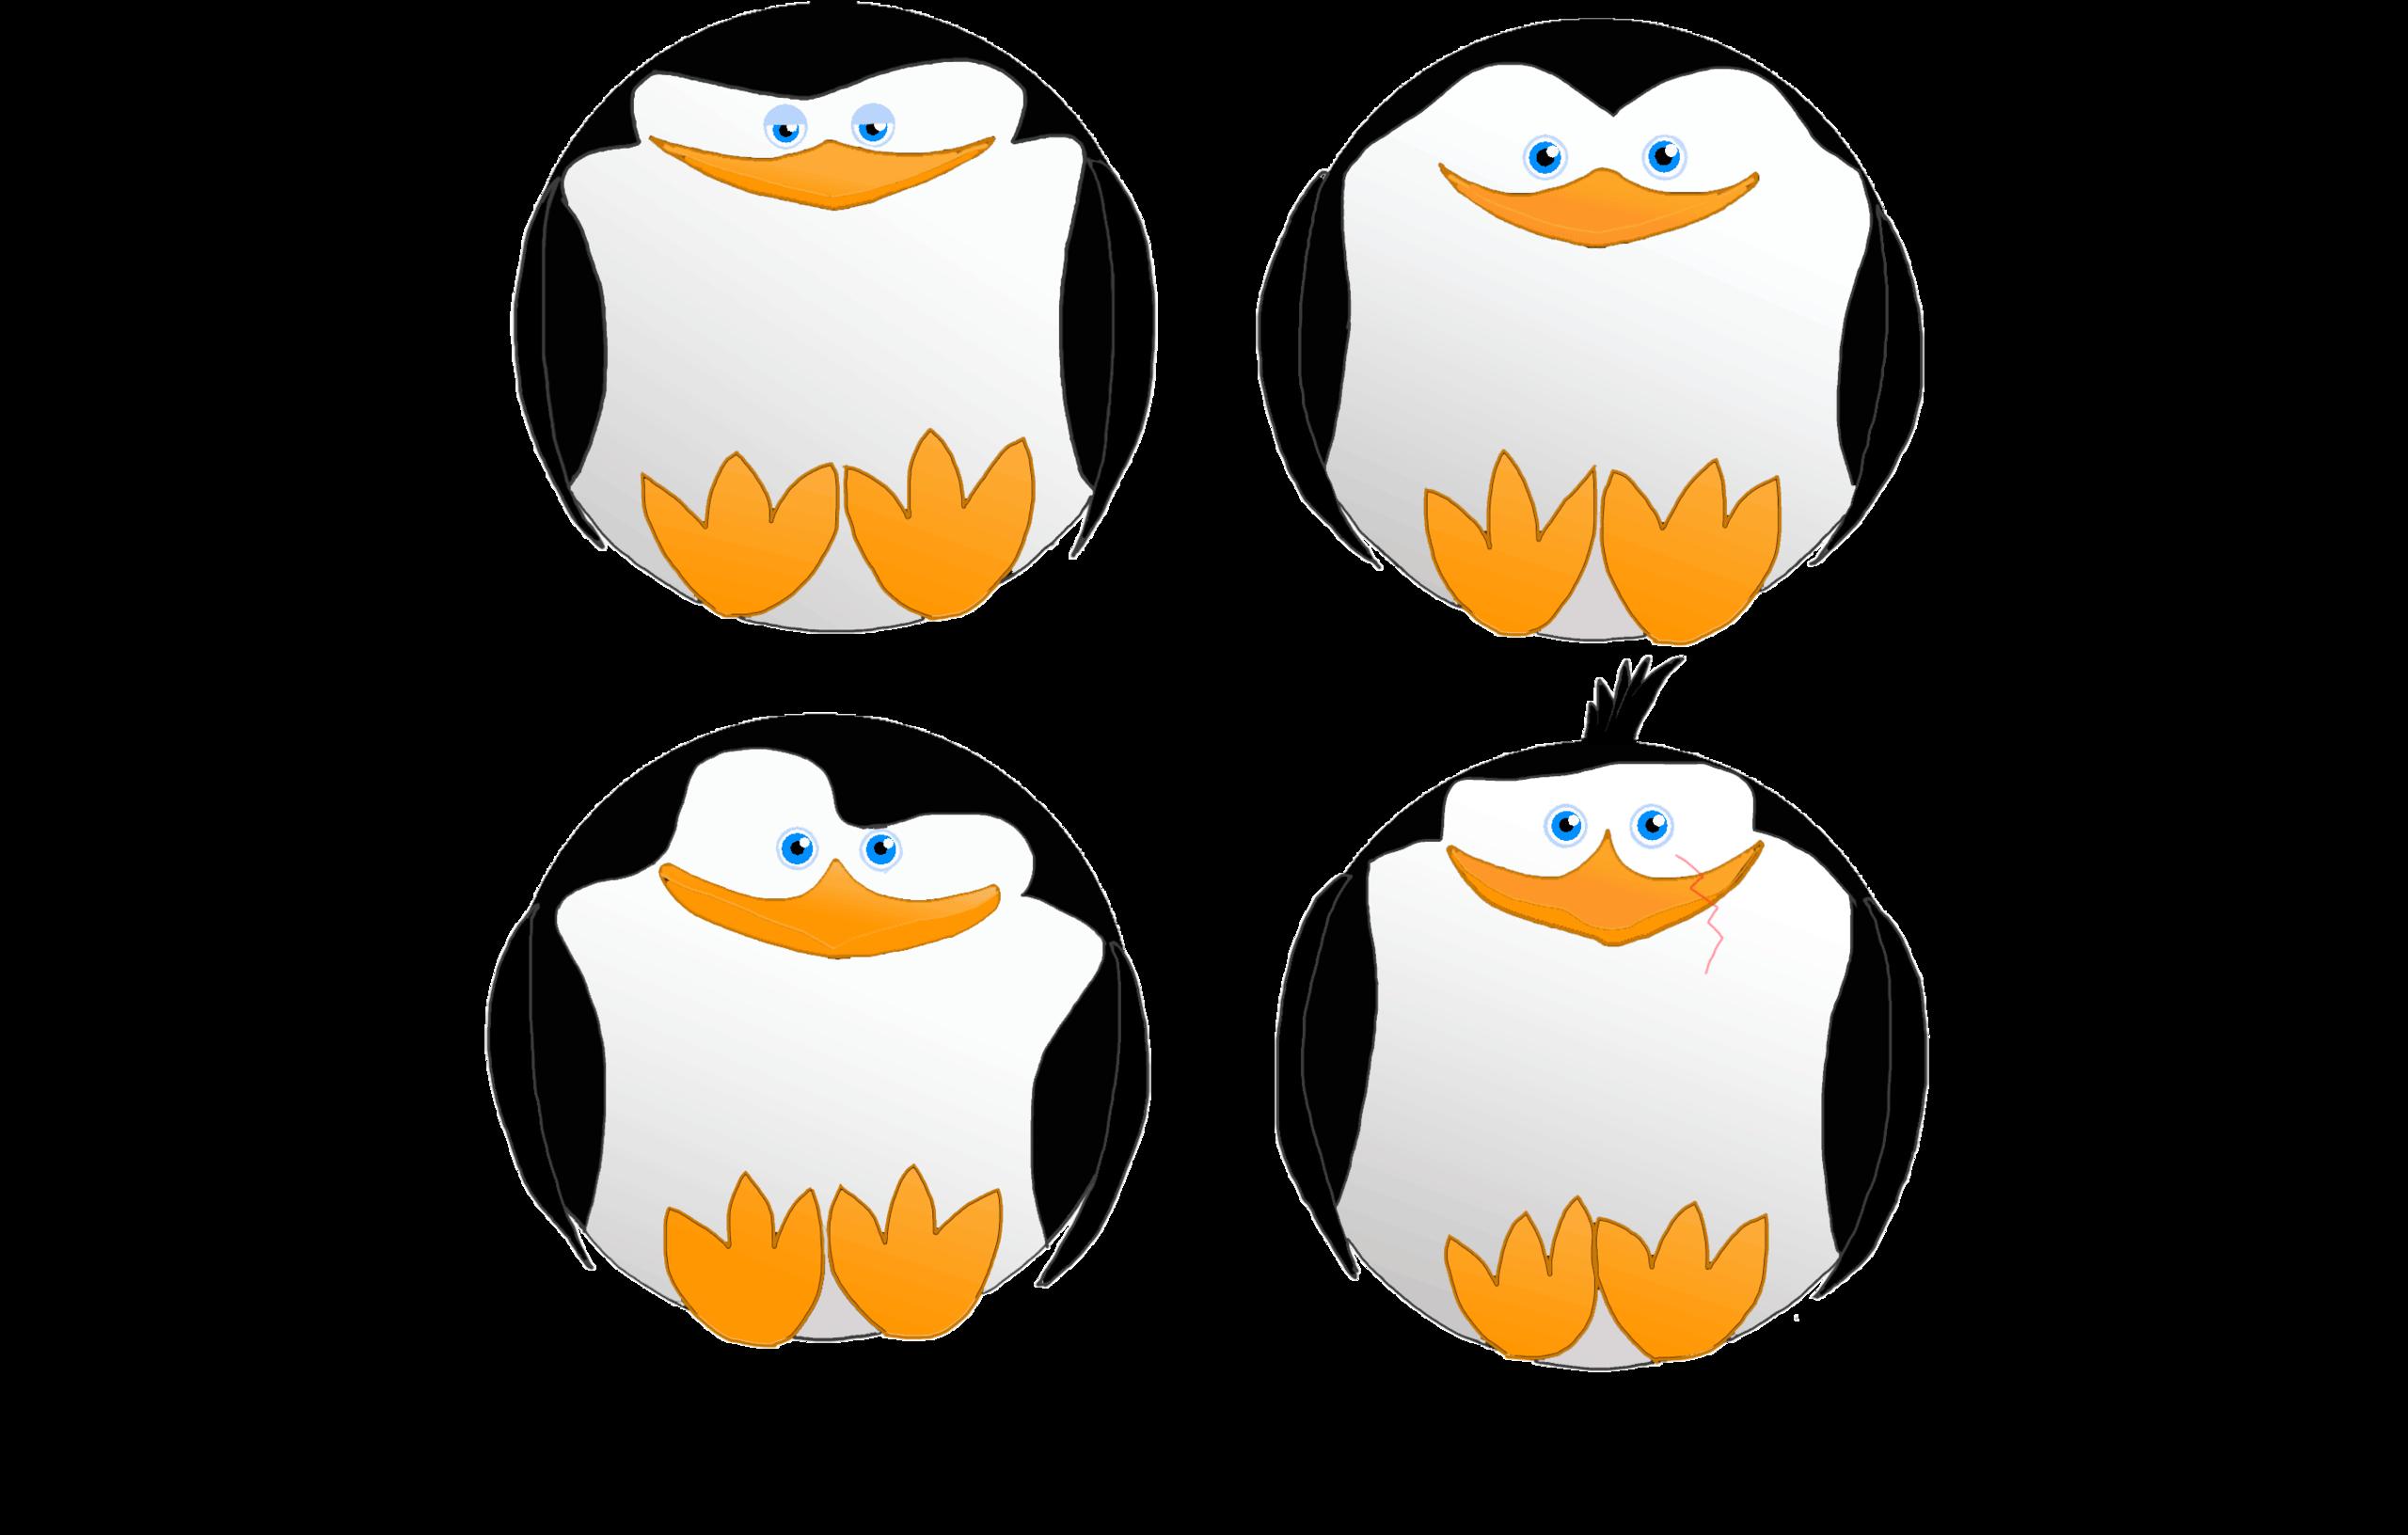 madagascar penguins | hayvanlar | pinterest | madagascar and penguins